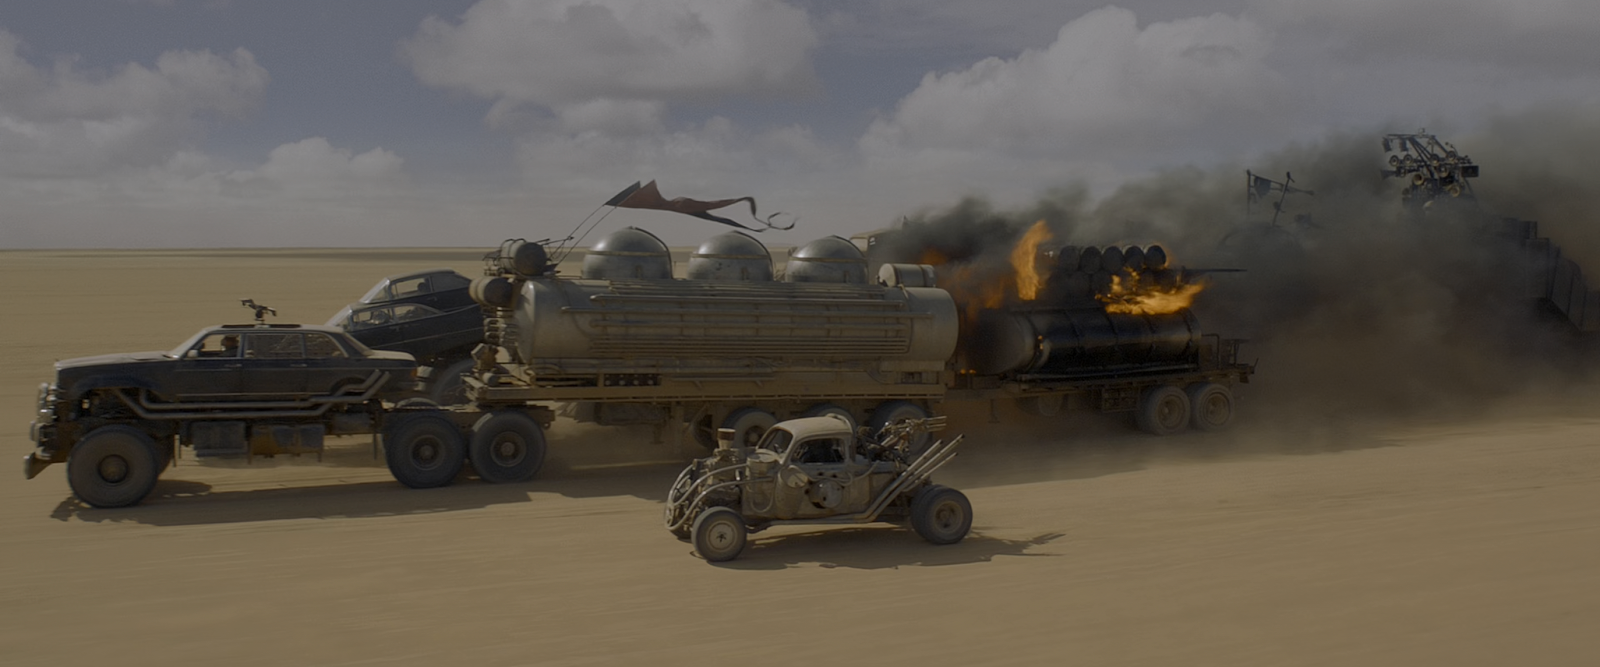 Mad Max: Furia en el Camino (2015) 4K UHD [HDR] Latino - Castellano - Ingles captura 4